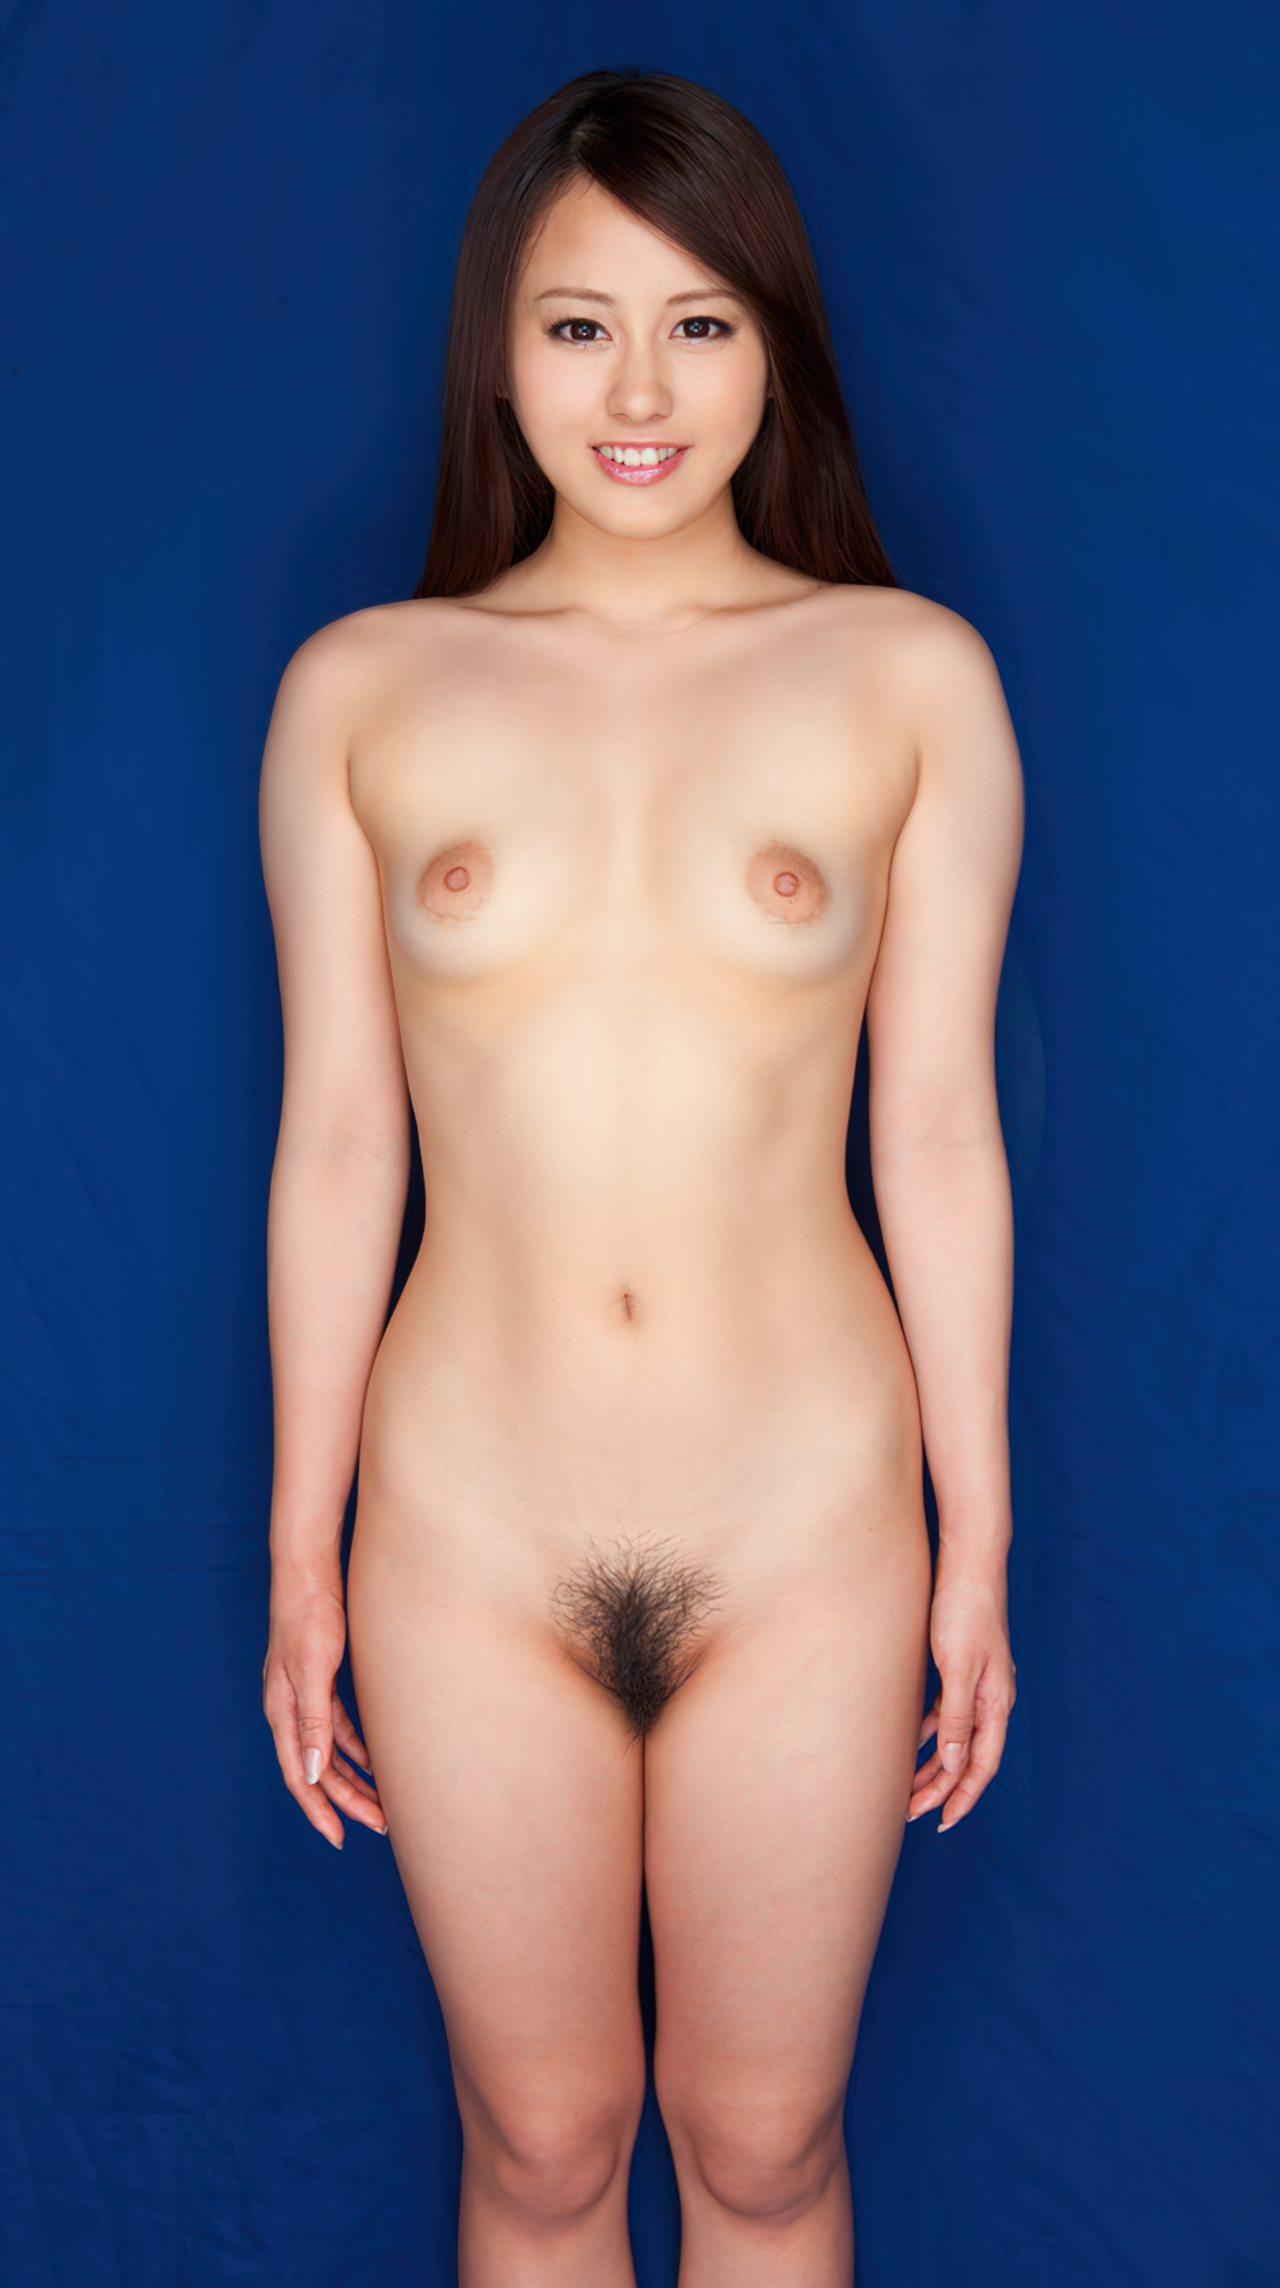 Mulheres Japonesas Peladas (10)